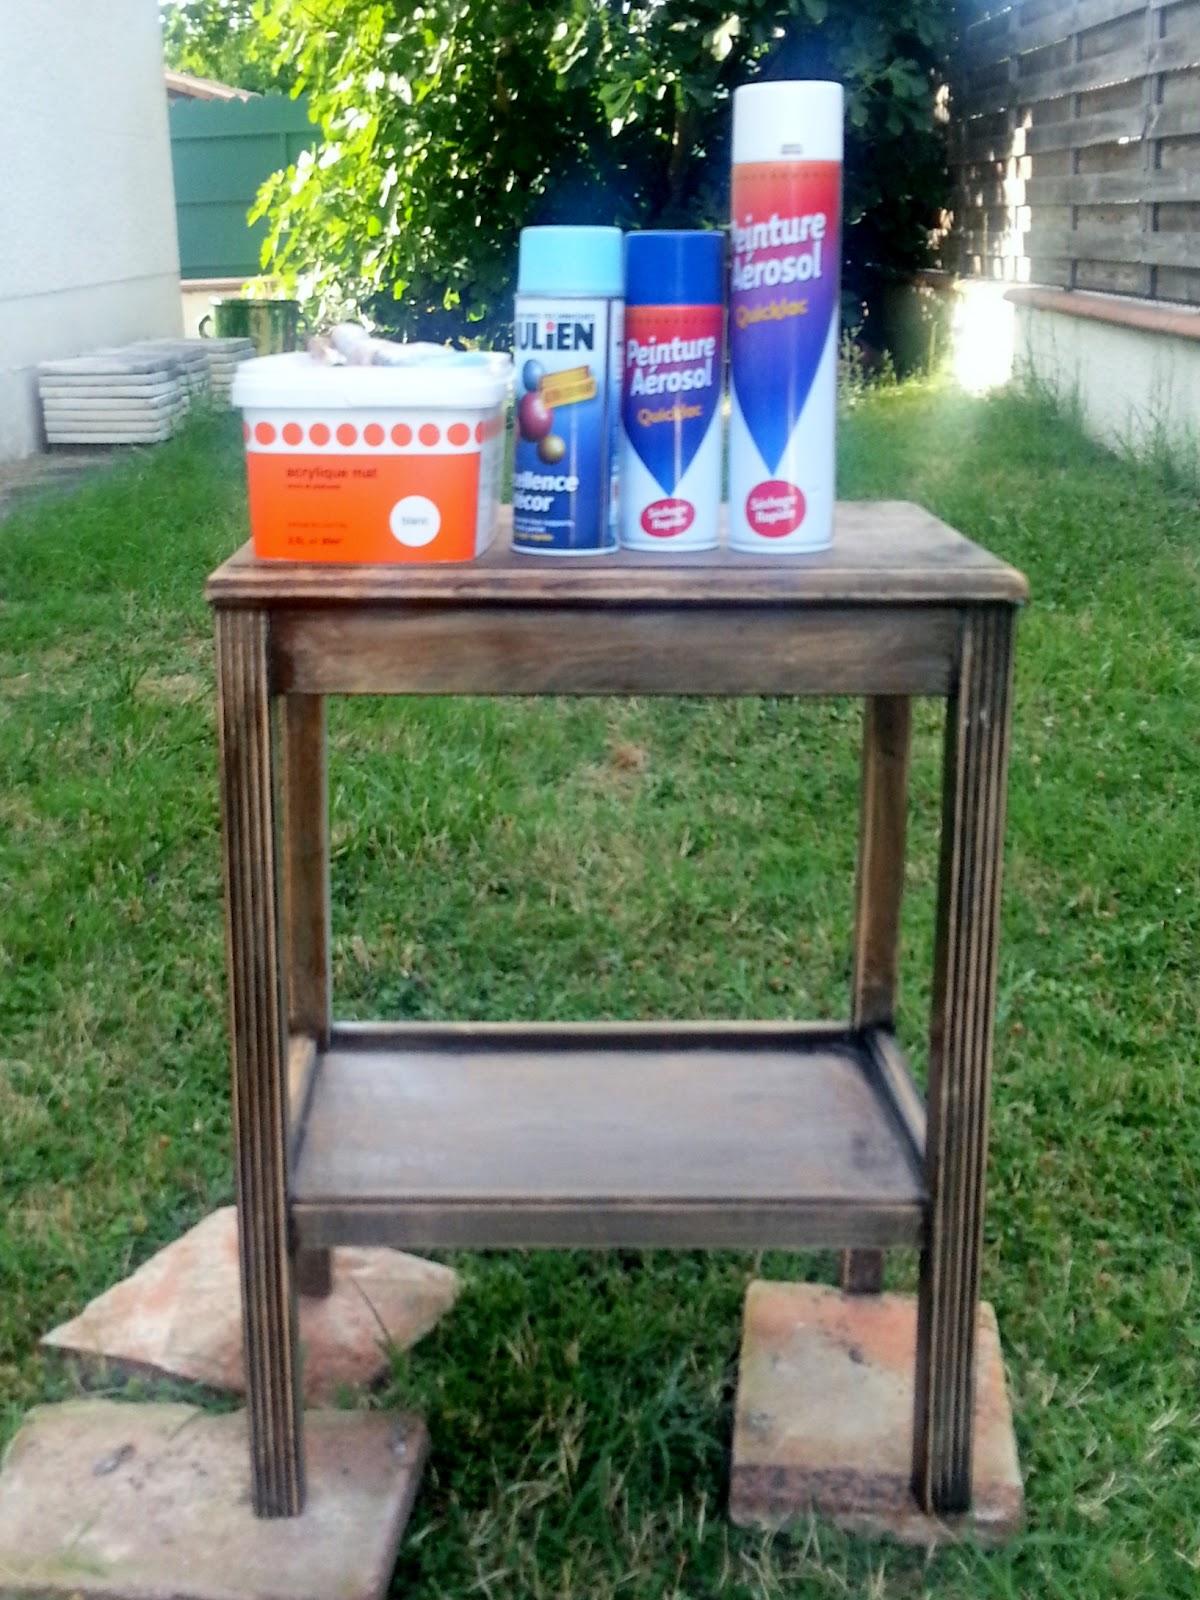 Pintar con aerosol diy soy un mix for Pintar muebles con spray